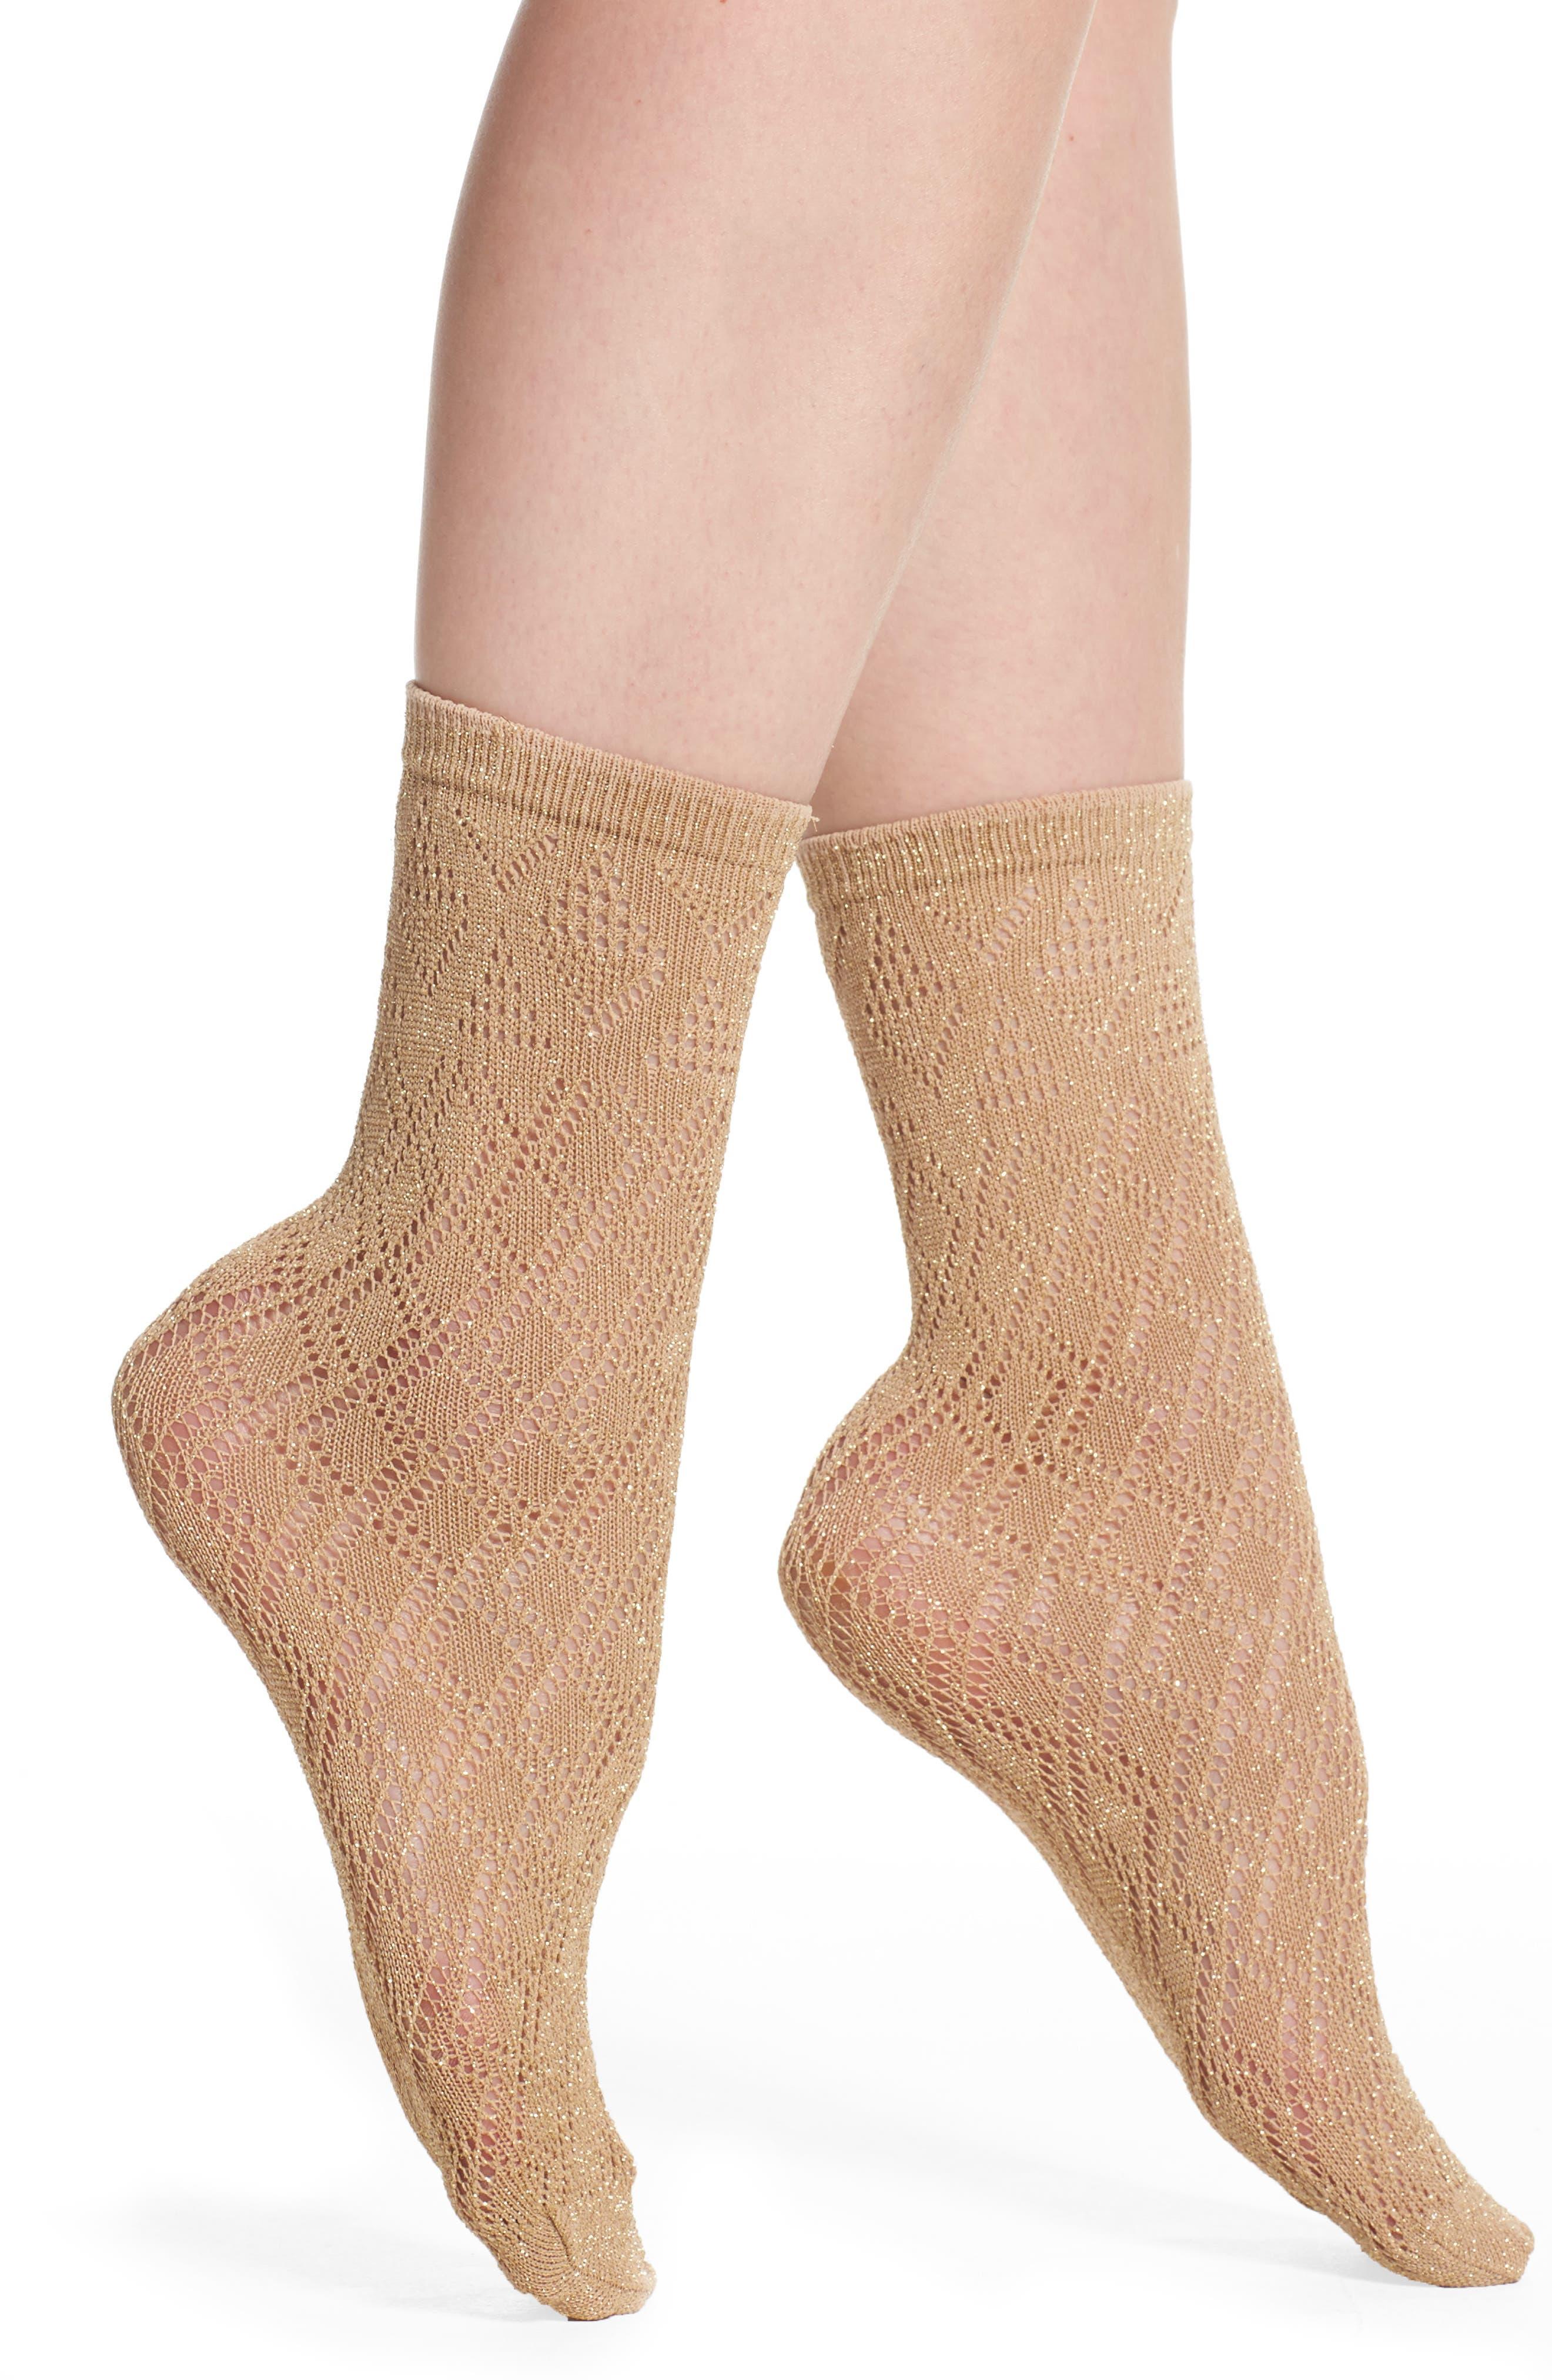 Main Image - Oroblu Kathy Trouser Socks